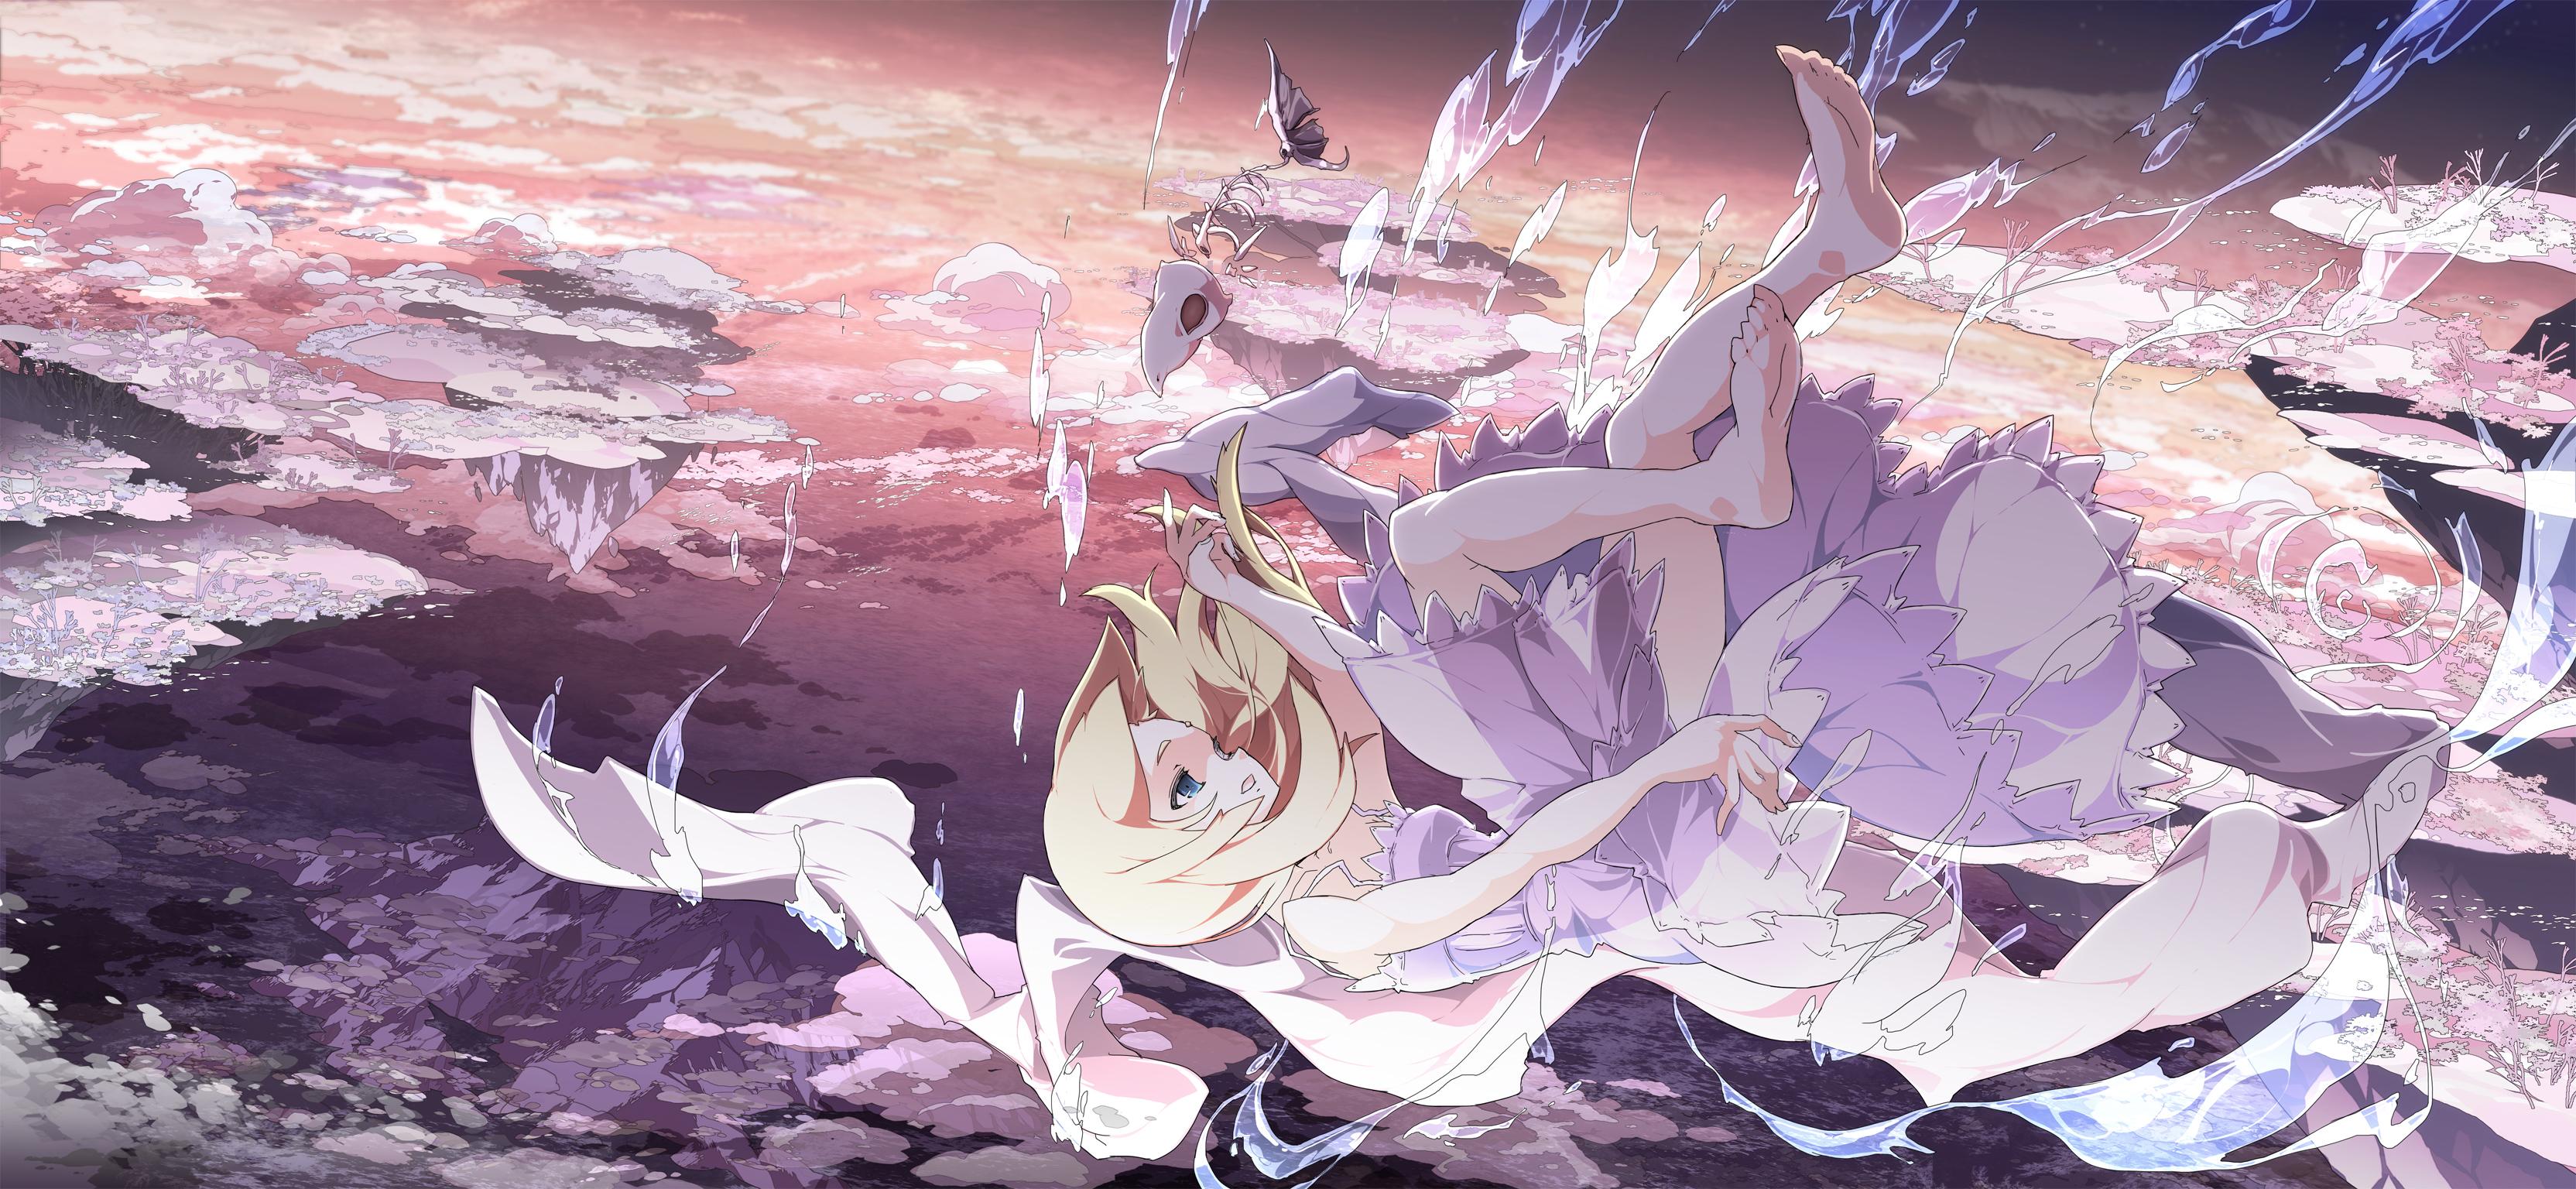 Pics Of Anime Girl Falling